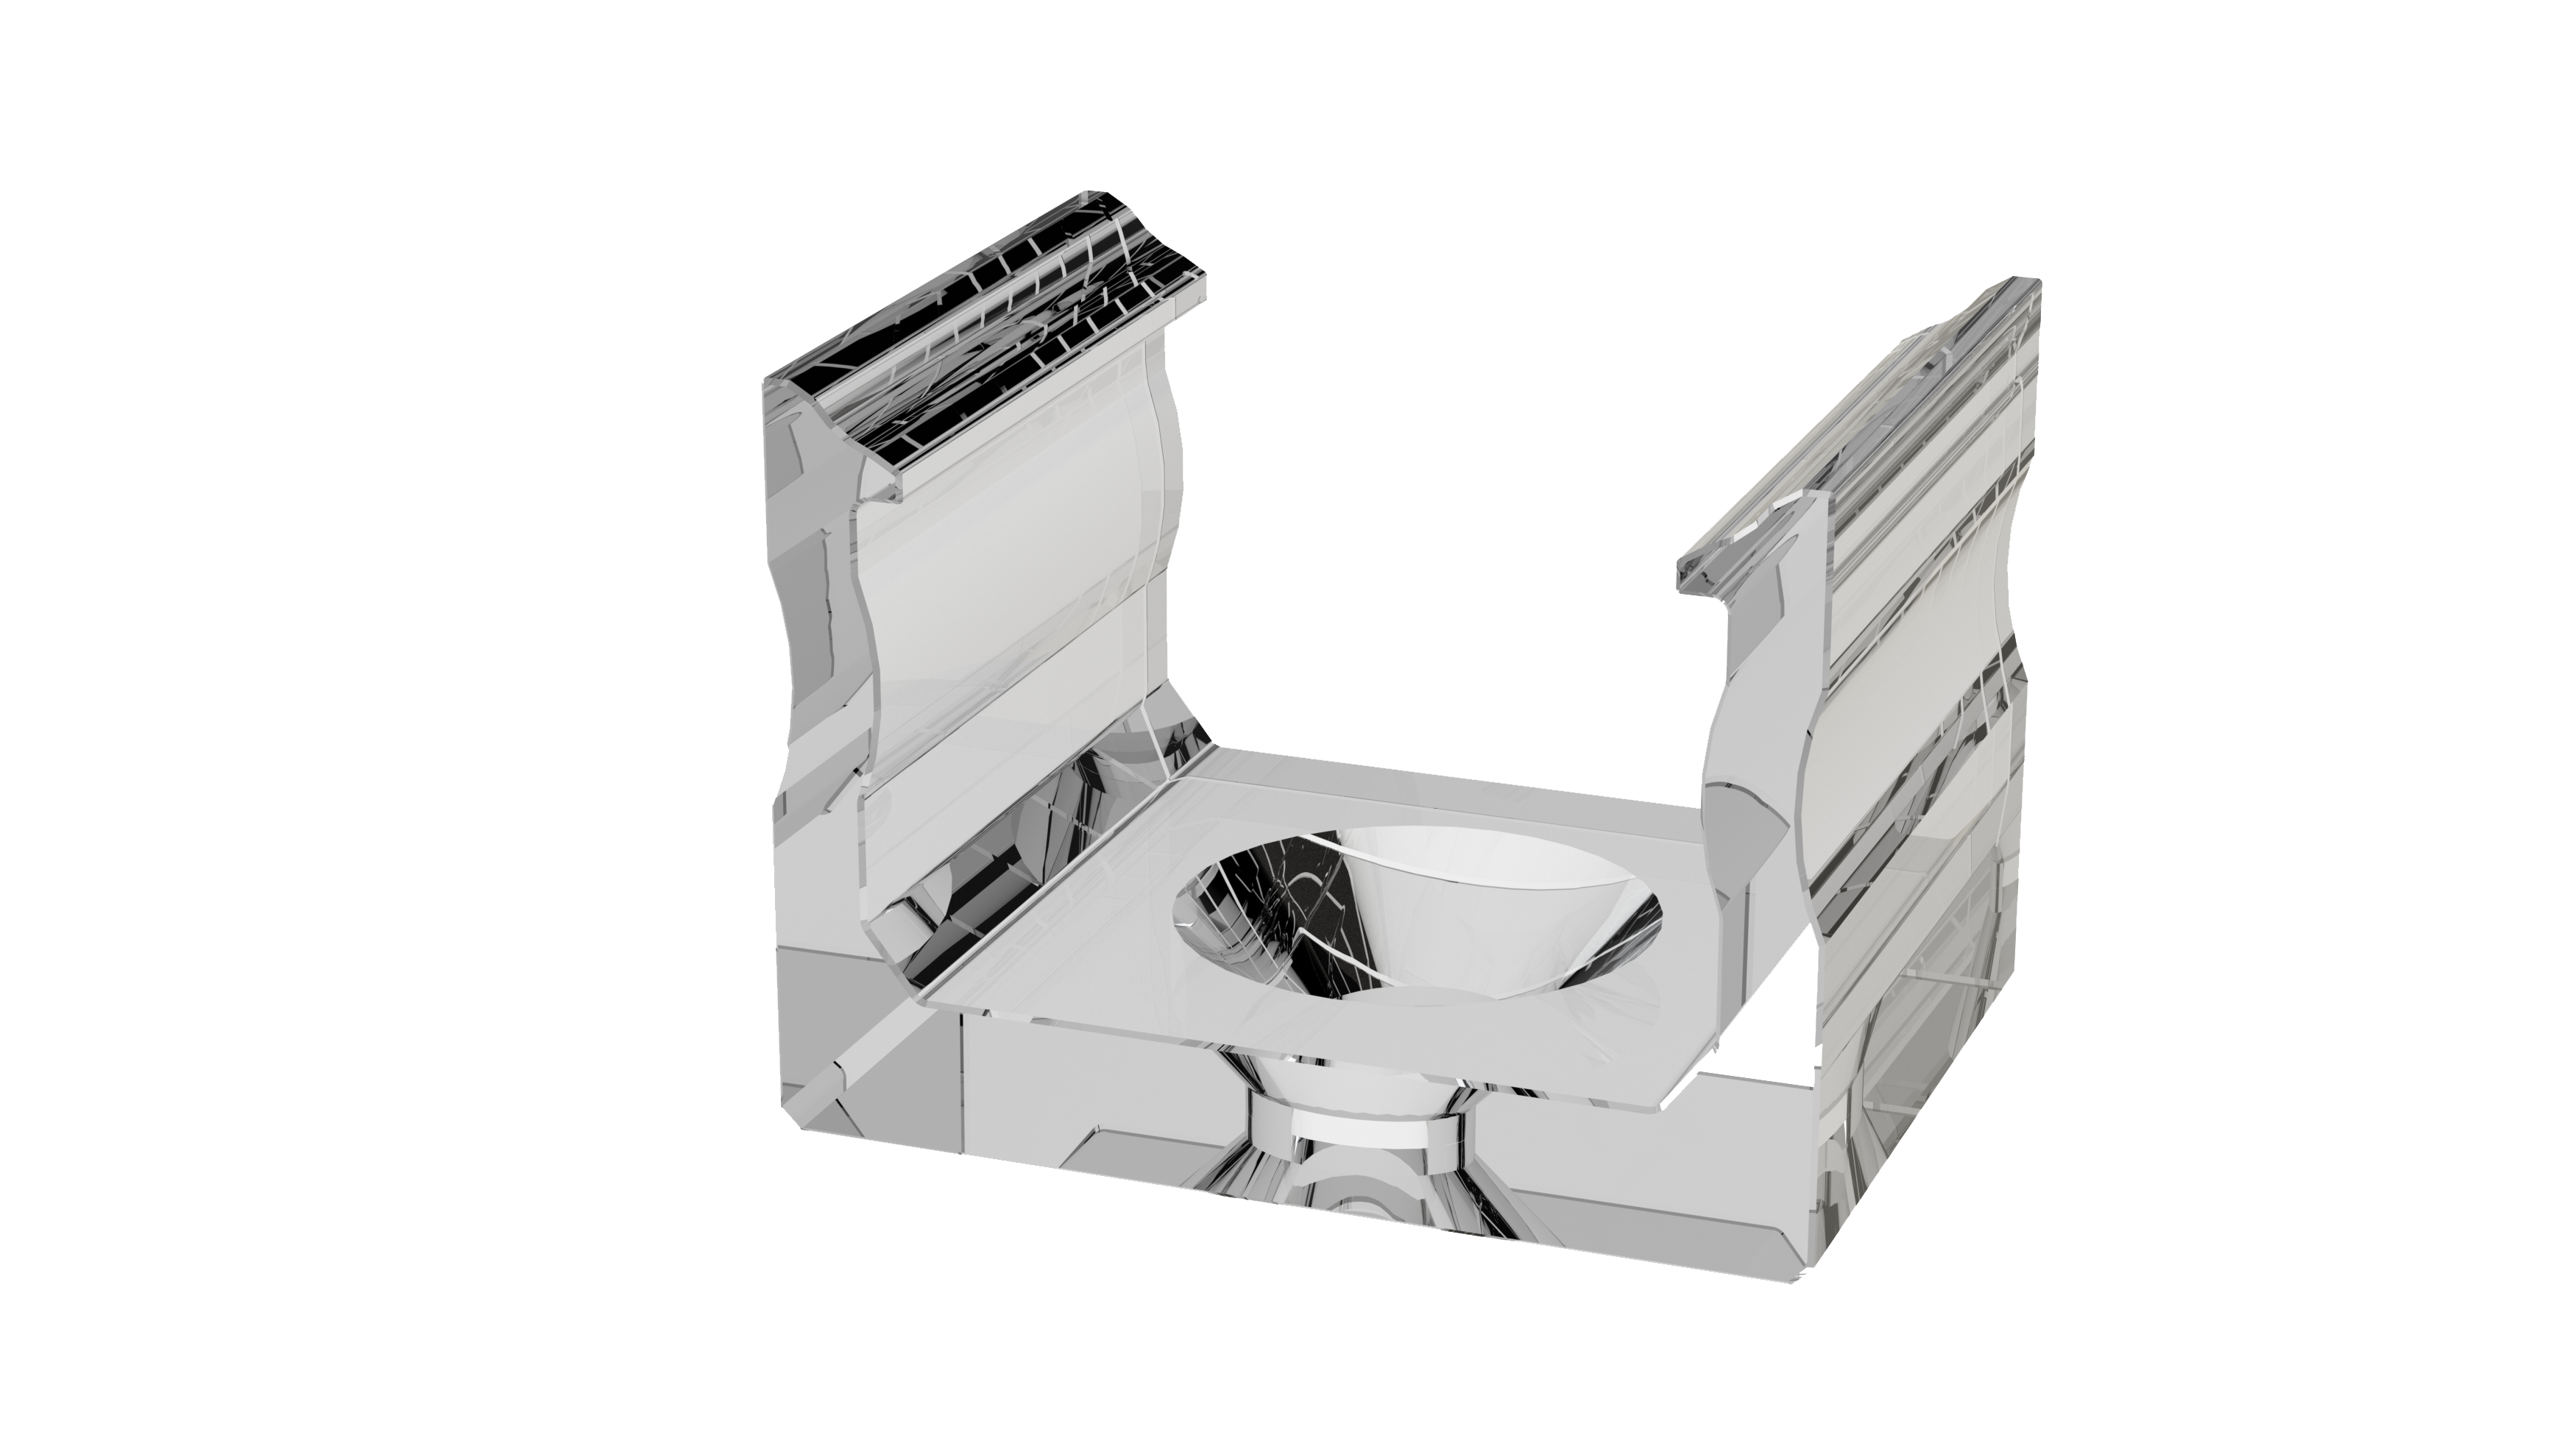 a-basic-mounting-bracket.png